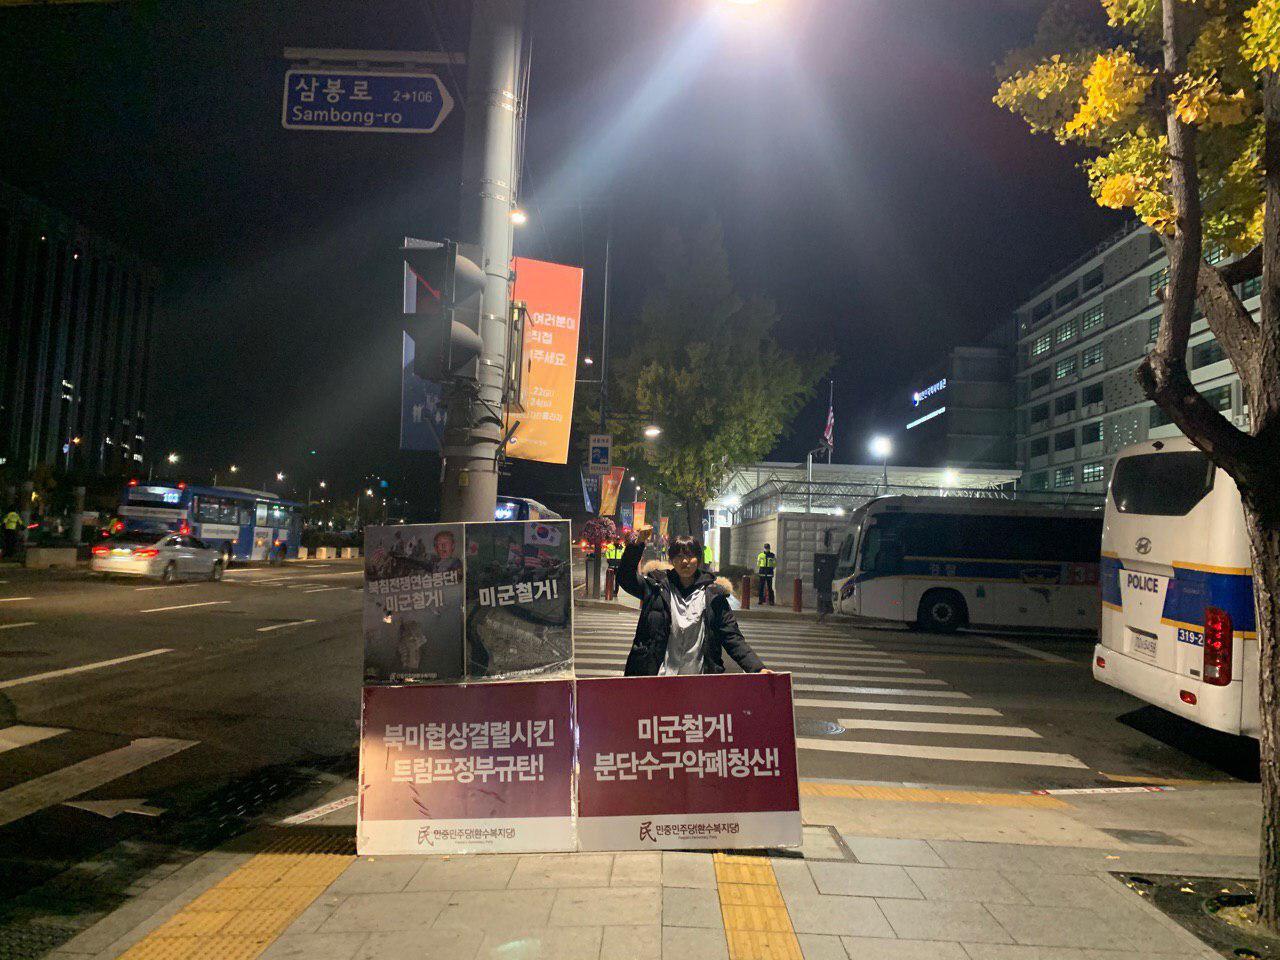 photo_2019-11-05_22-40-32.jpg